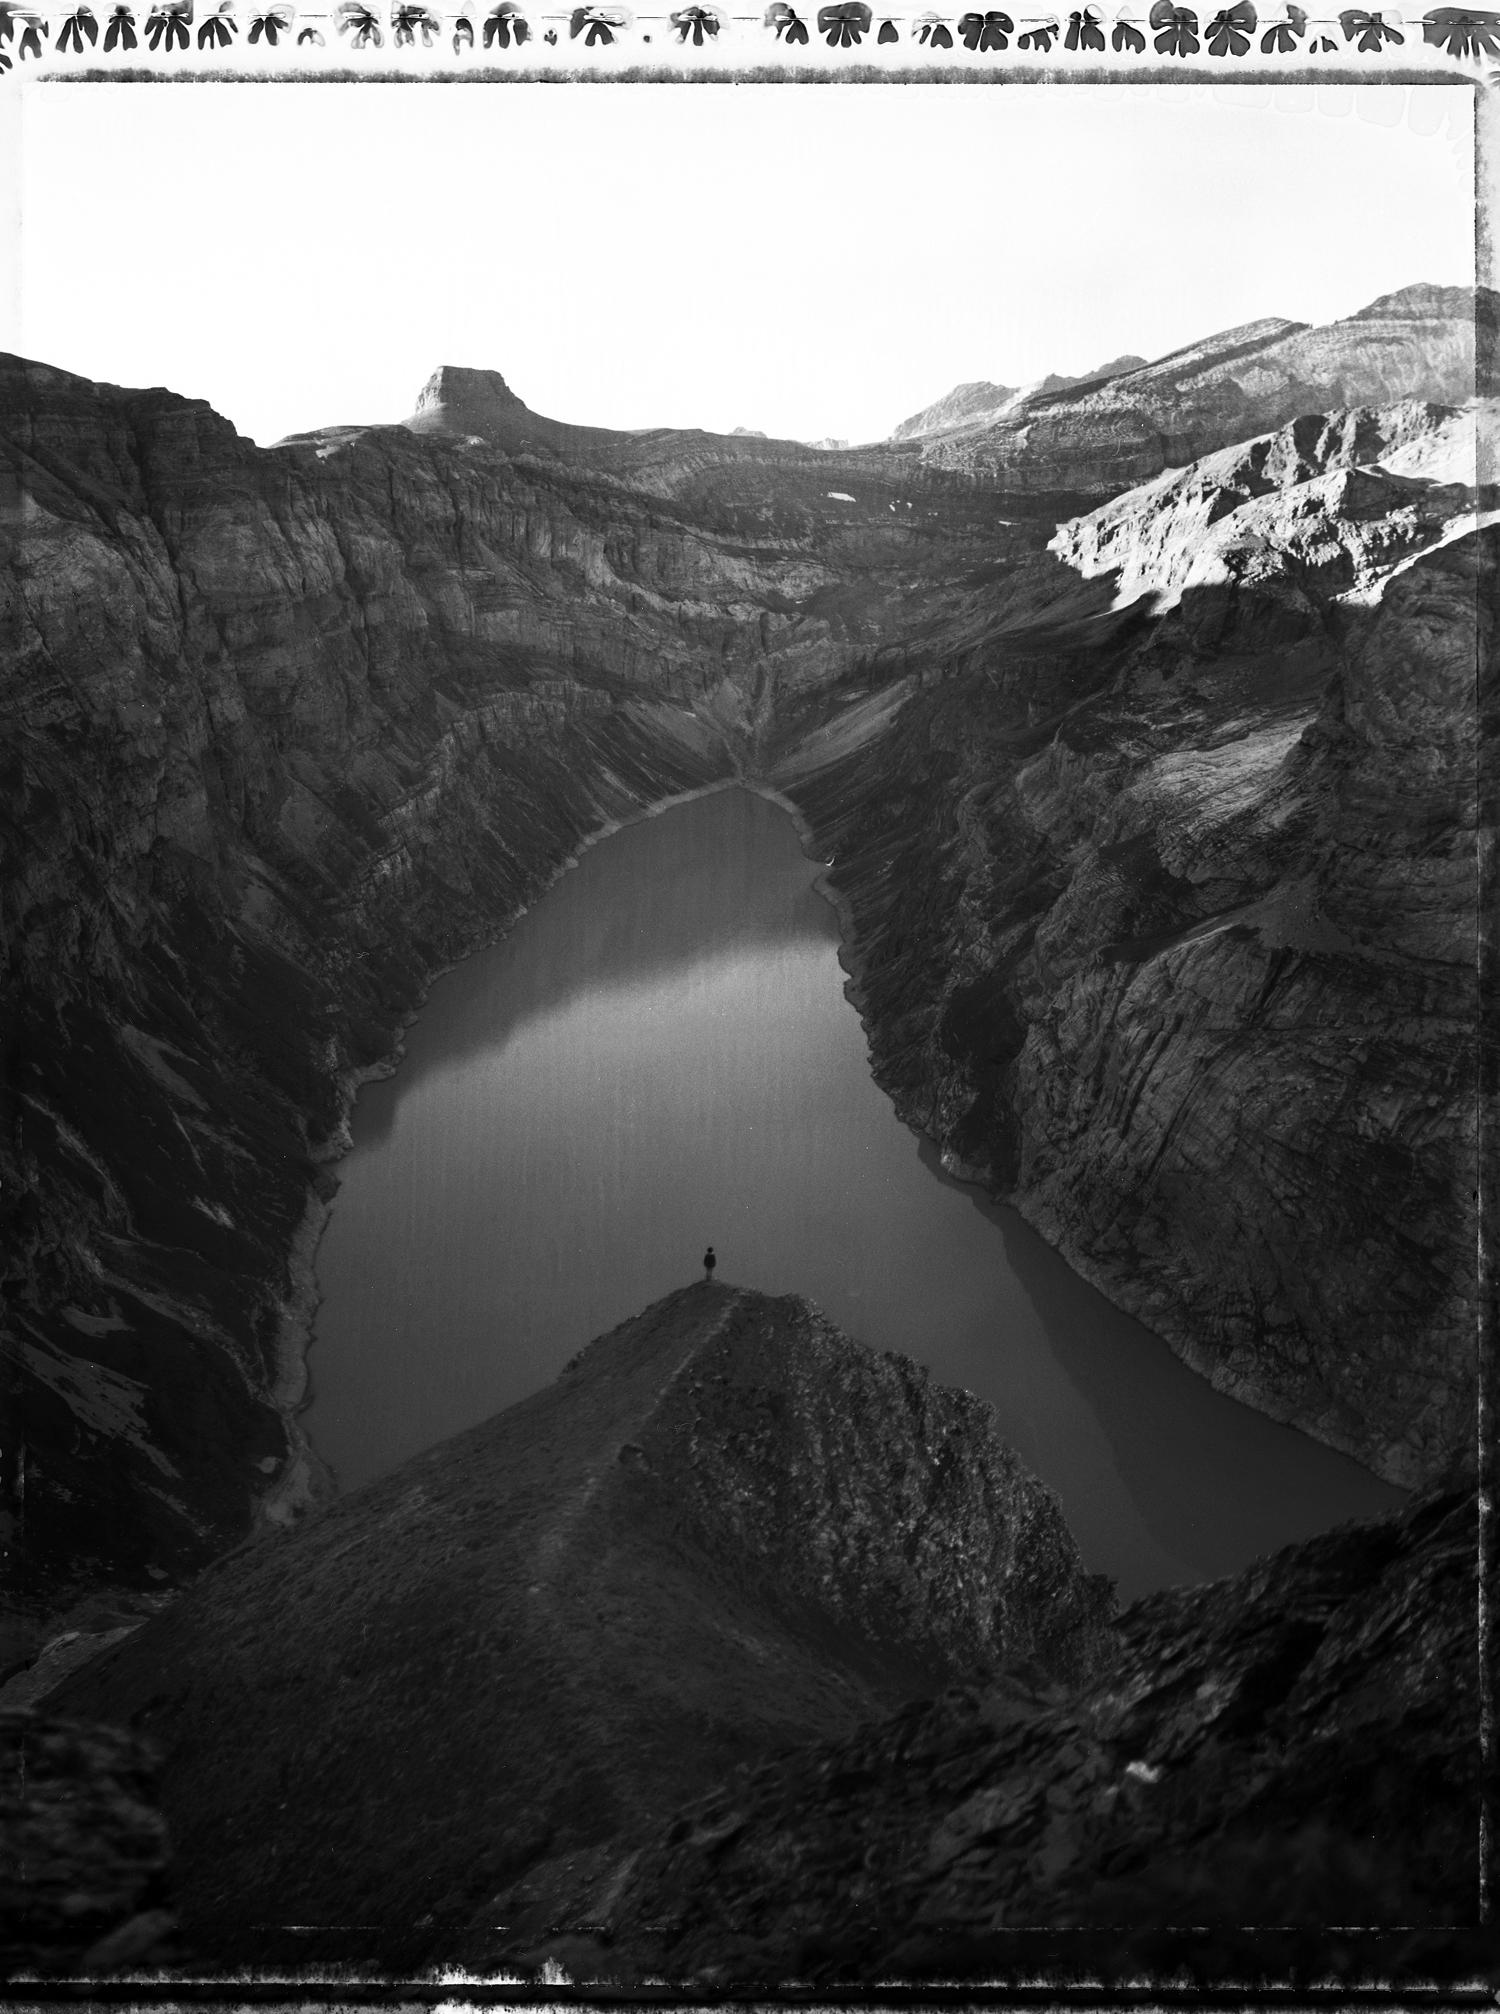 """Small Human, Big Land, Great Thoughts"" by Bastian Kalous"